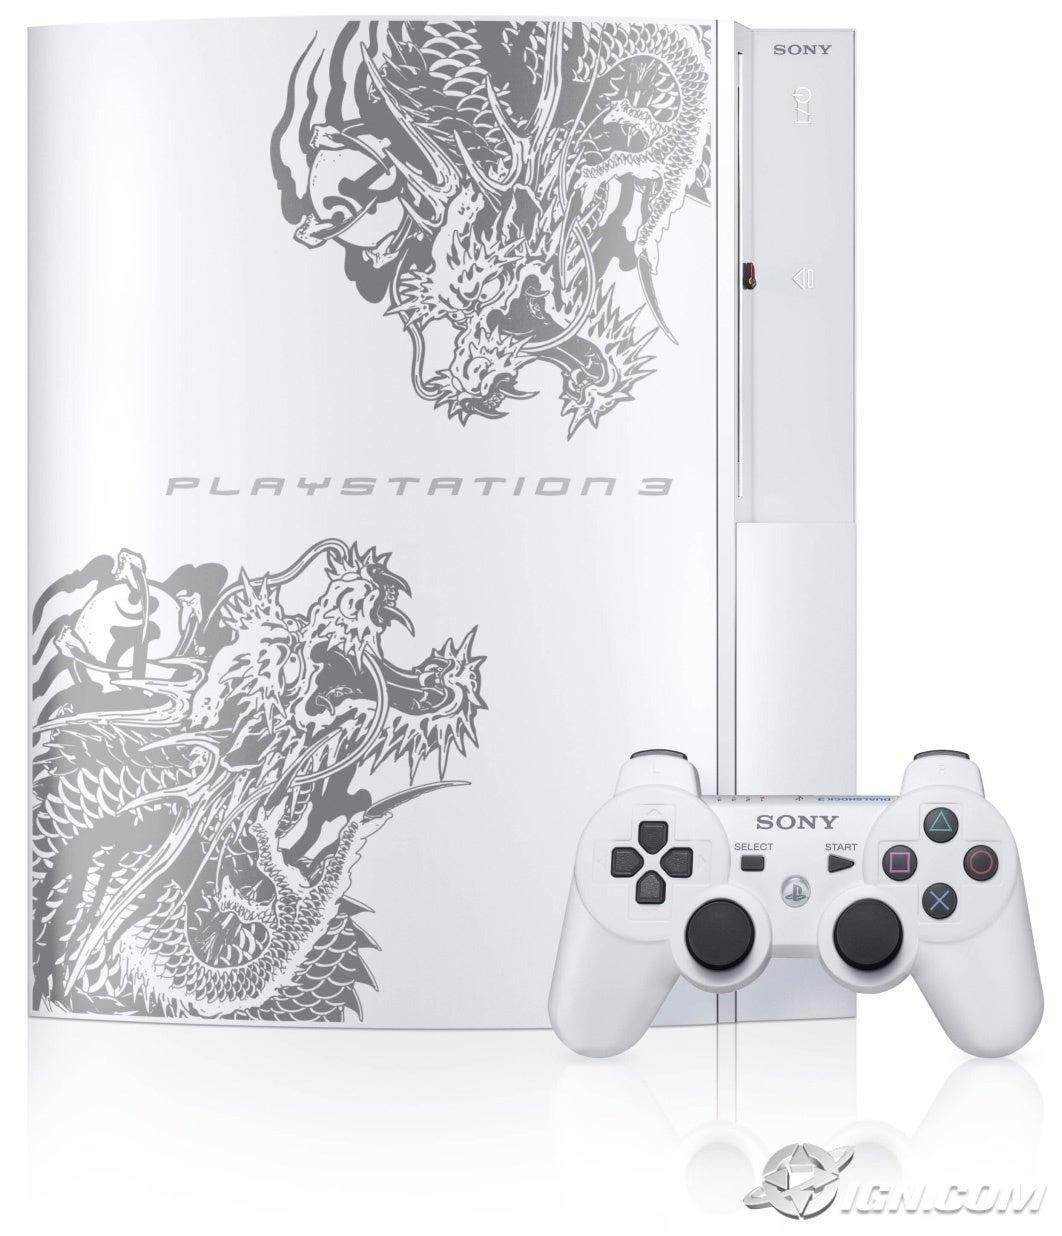 Console PS3  Ryu Ga Gotoku 5 Dragon-ps3-bundled-with-yakuza-3-20090106083630835